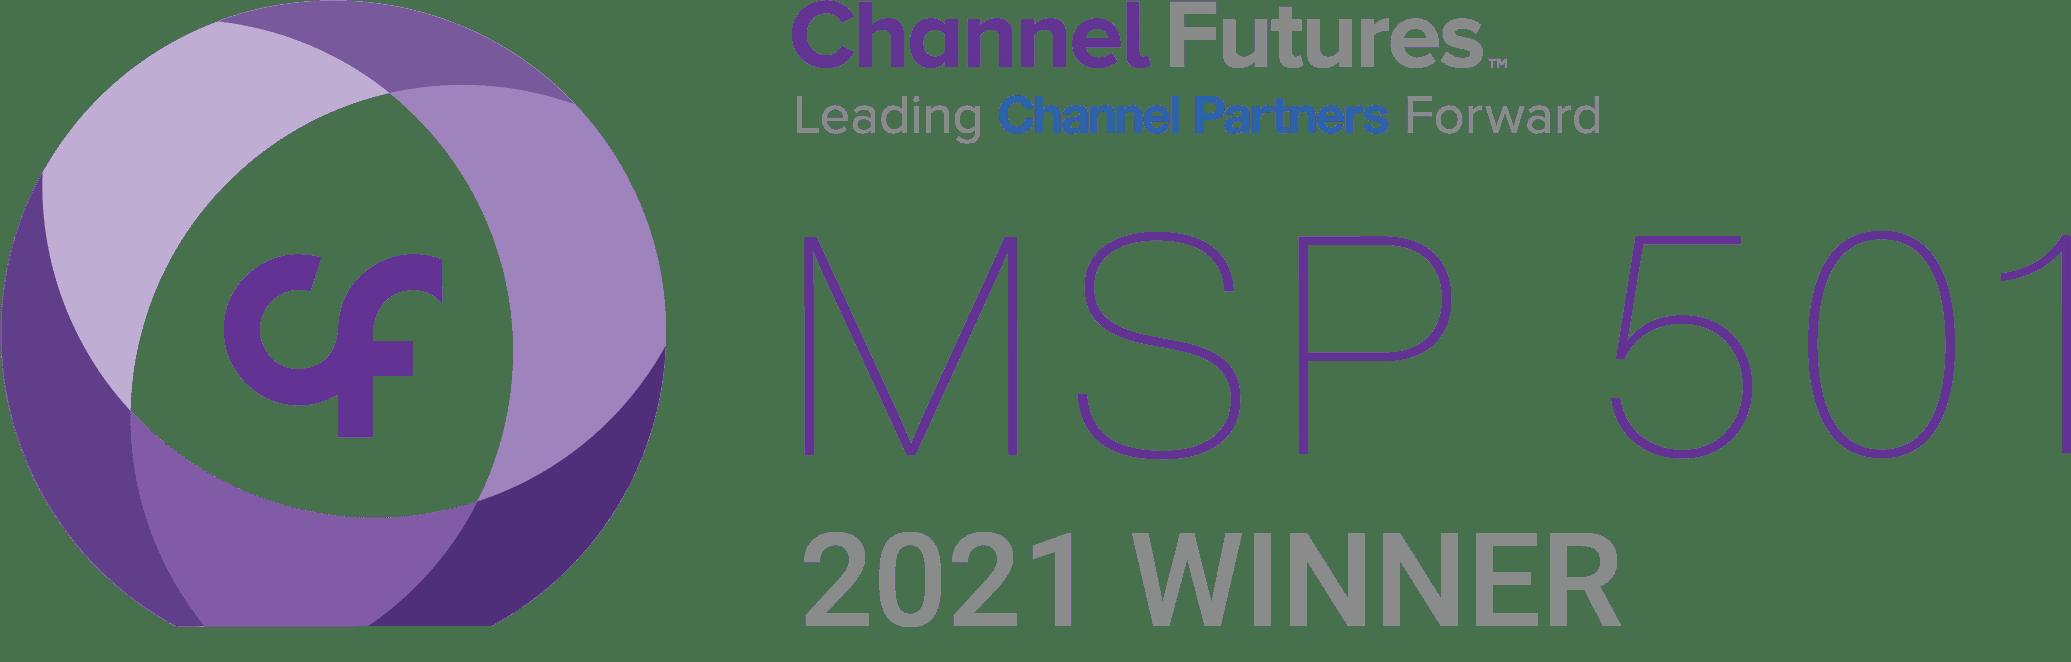 CP 1381 MSP 501 Winner Logo 2021 V1